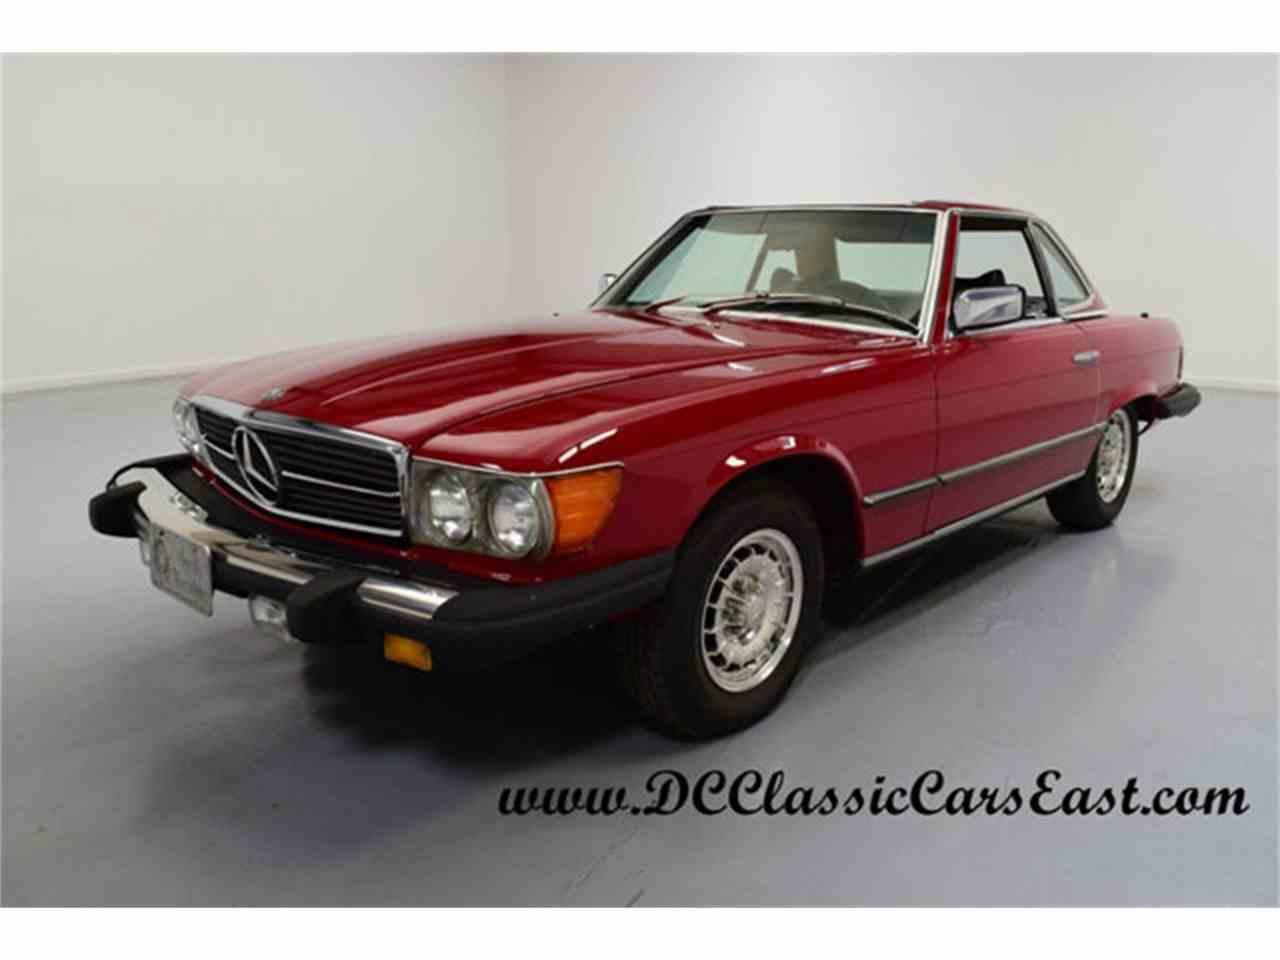 1979 Mercedes-Benz 450SL for Sale - CC-987943